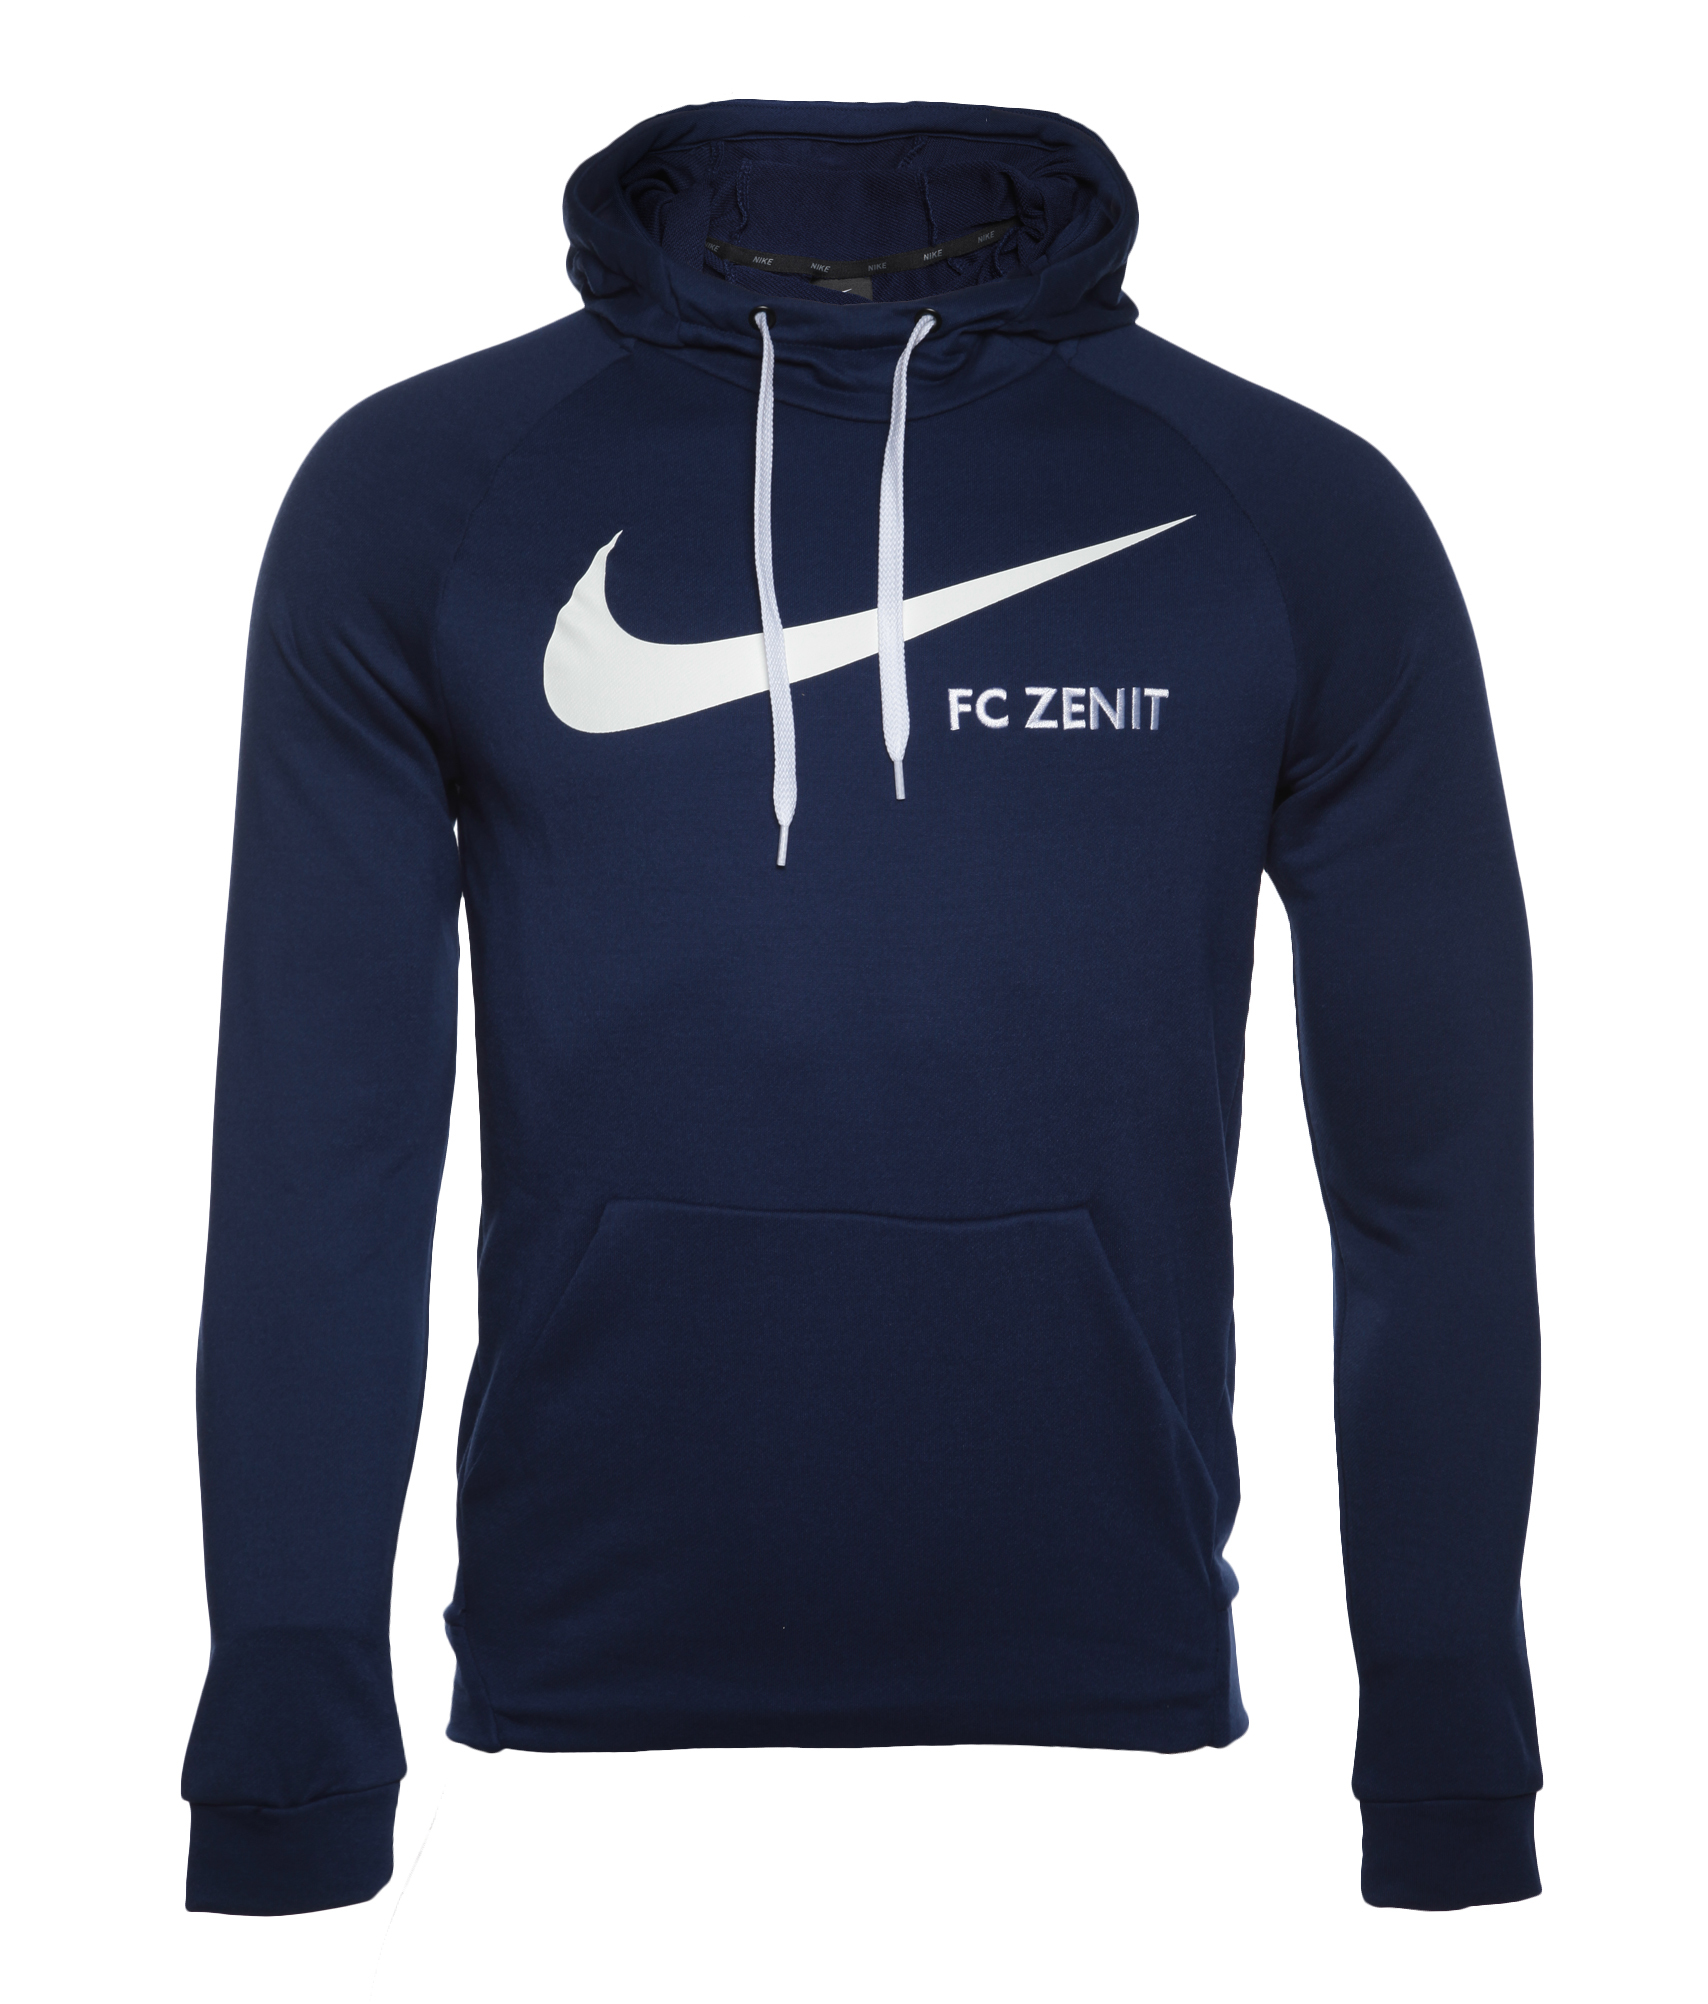 Толстовка тренировочная Nike, Цвет-Темно-Синий, Размер-L худи nike худи m nk dry hoodie po swoosh